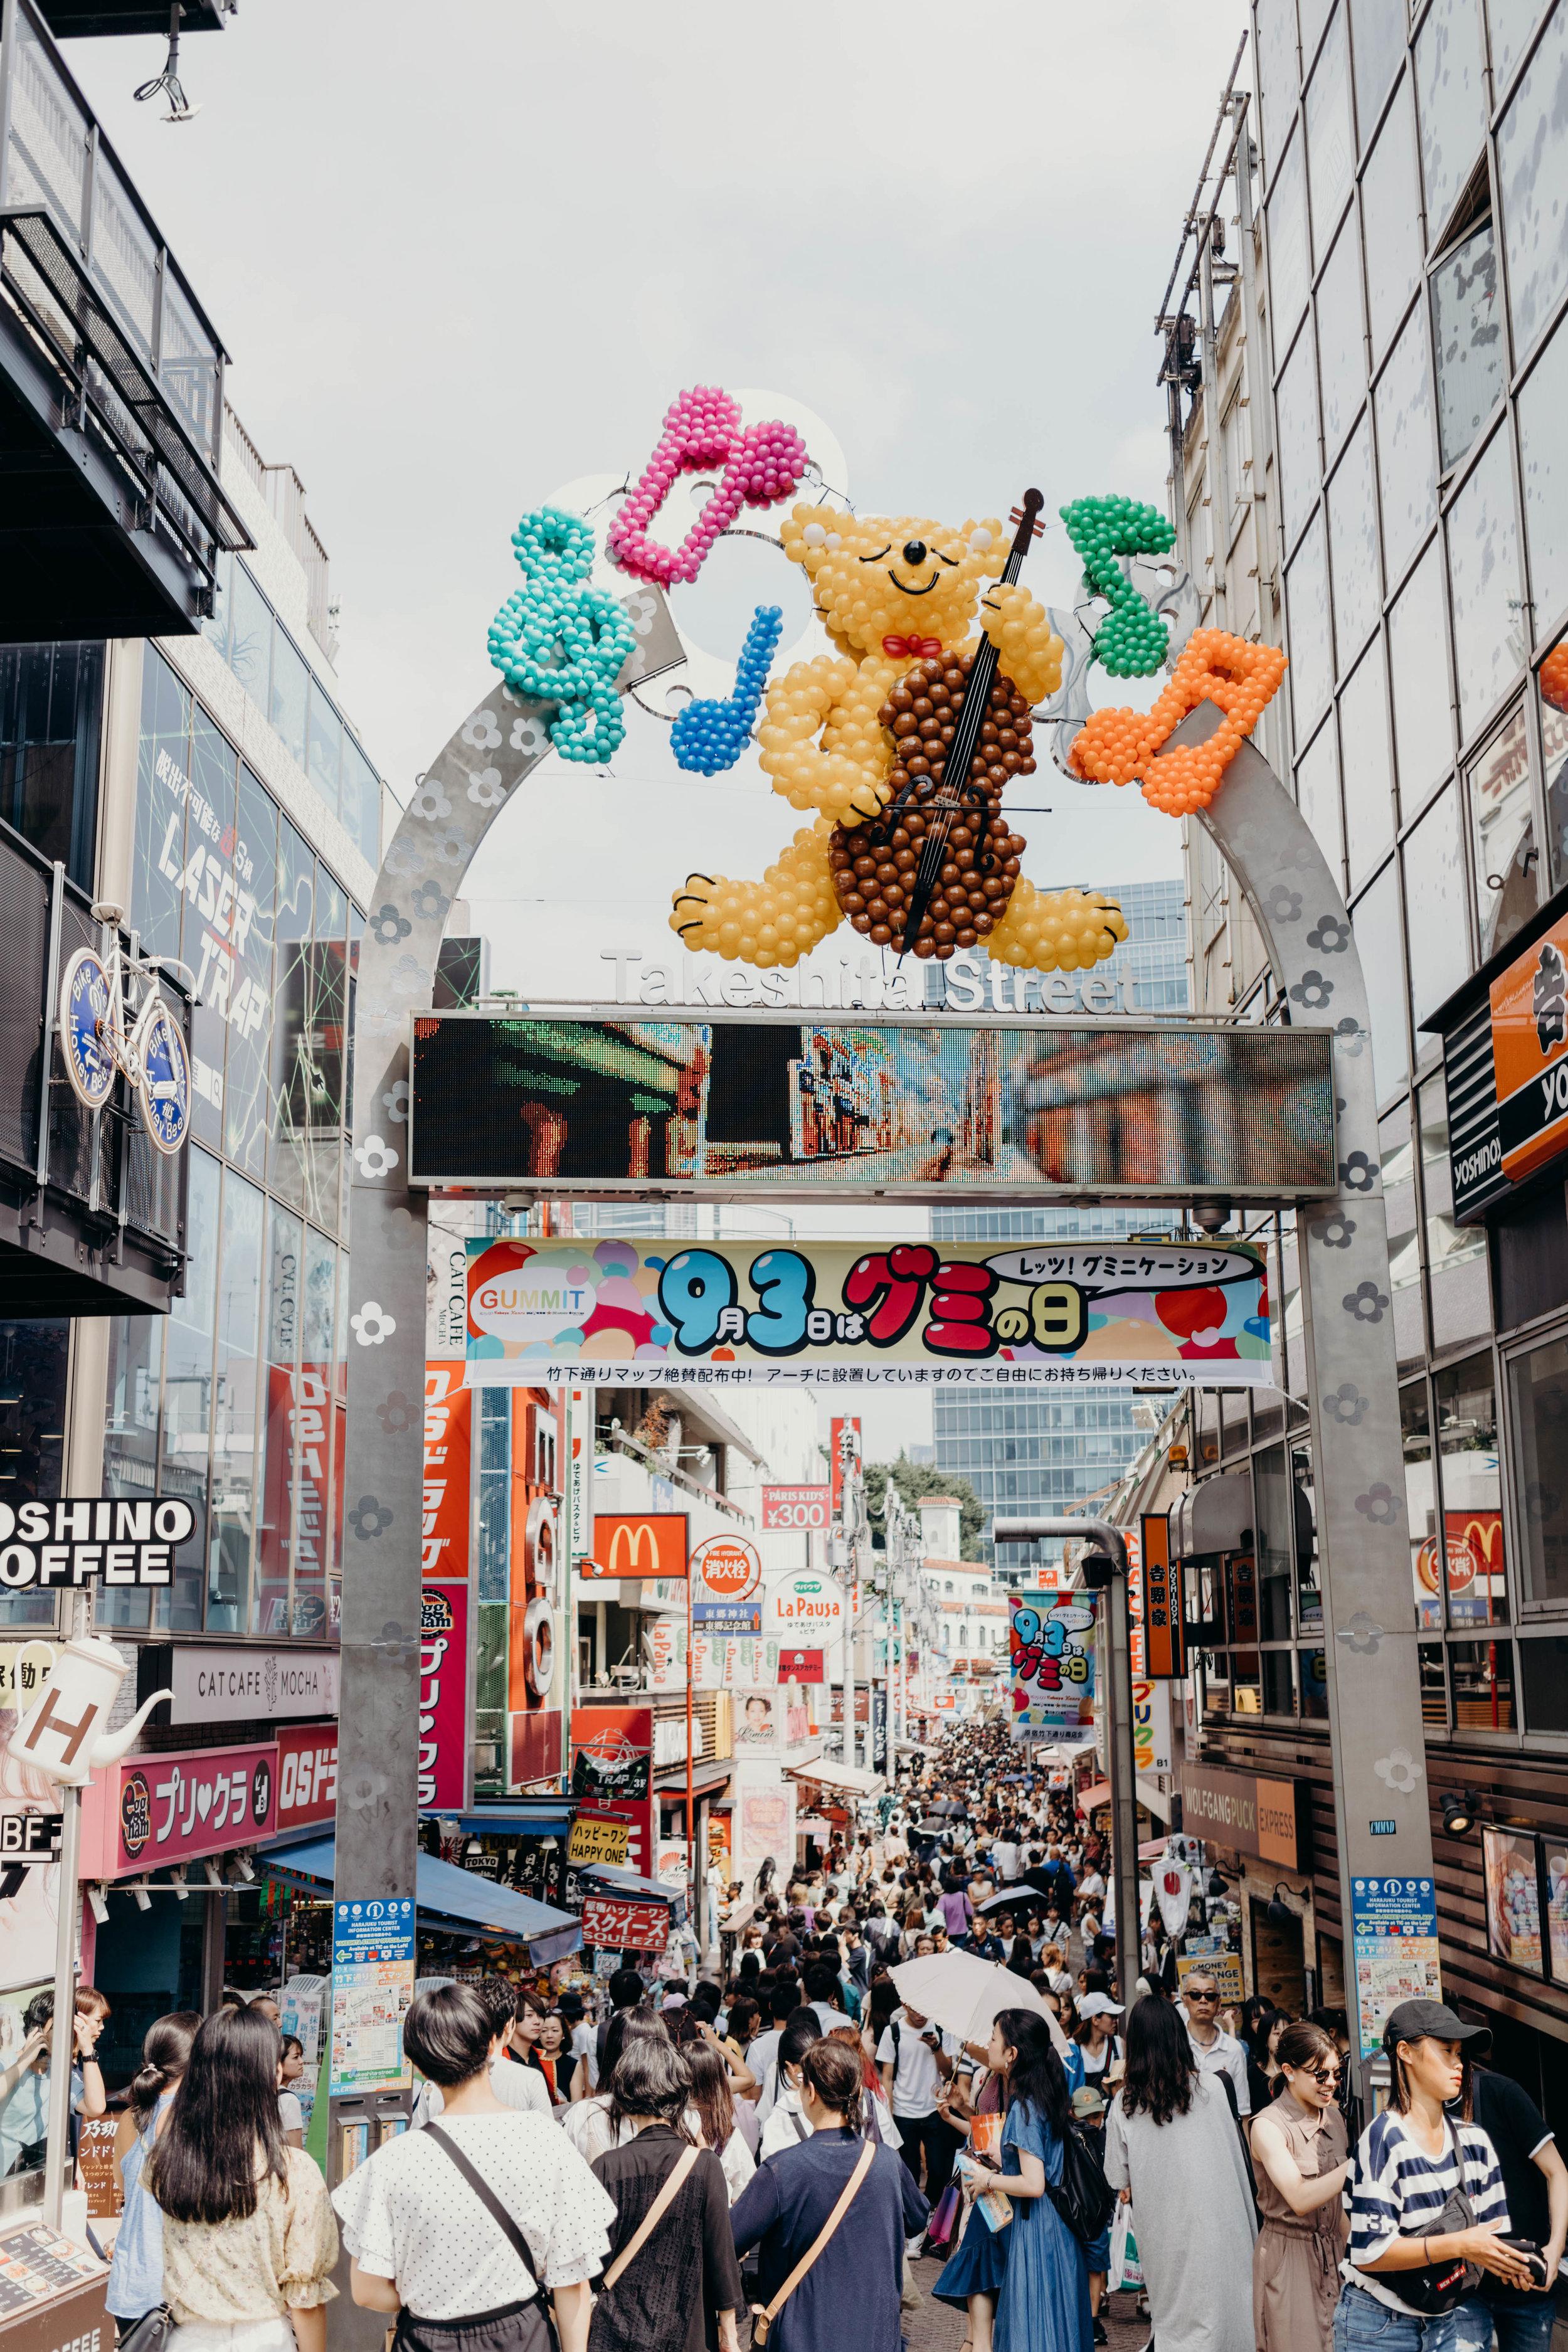 A Three-Day Girls' Trip to Tokyo | On the Street Where We Live ( aretherelilactrees.com )  Takeshita Street, Harajuku, Tokyo, Japan